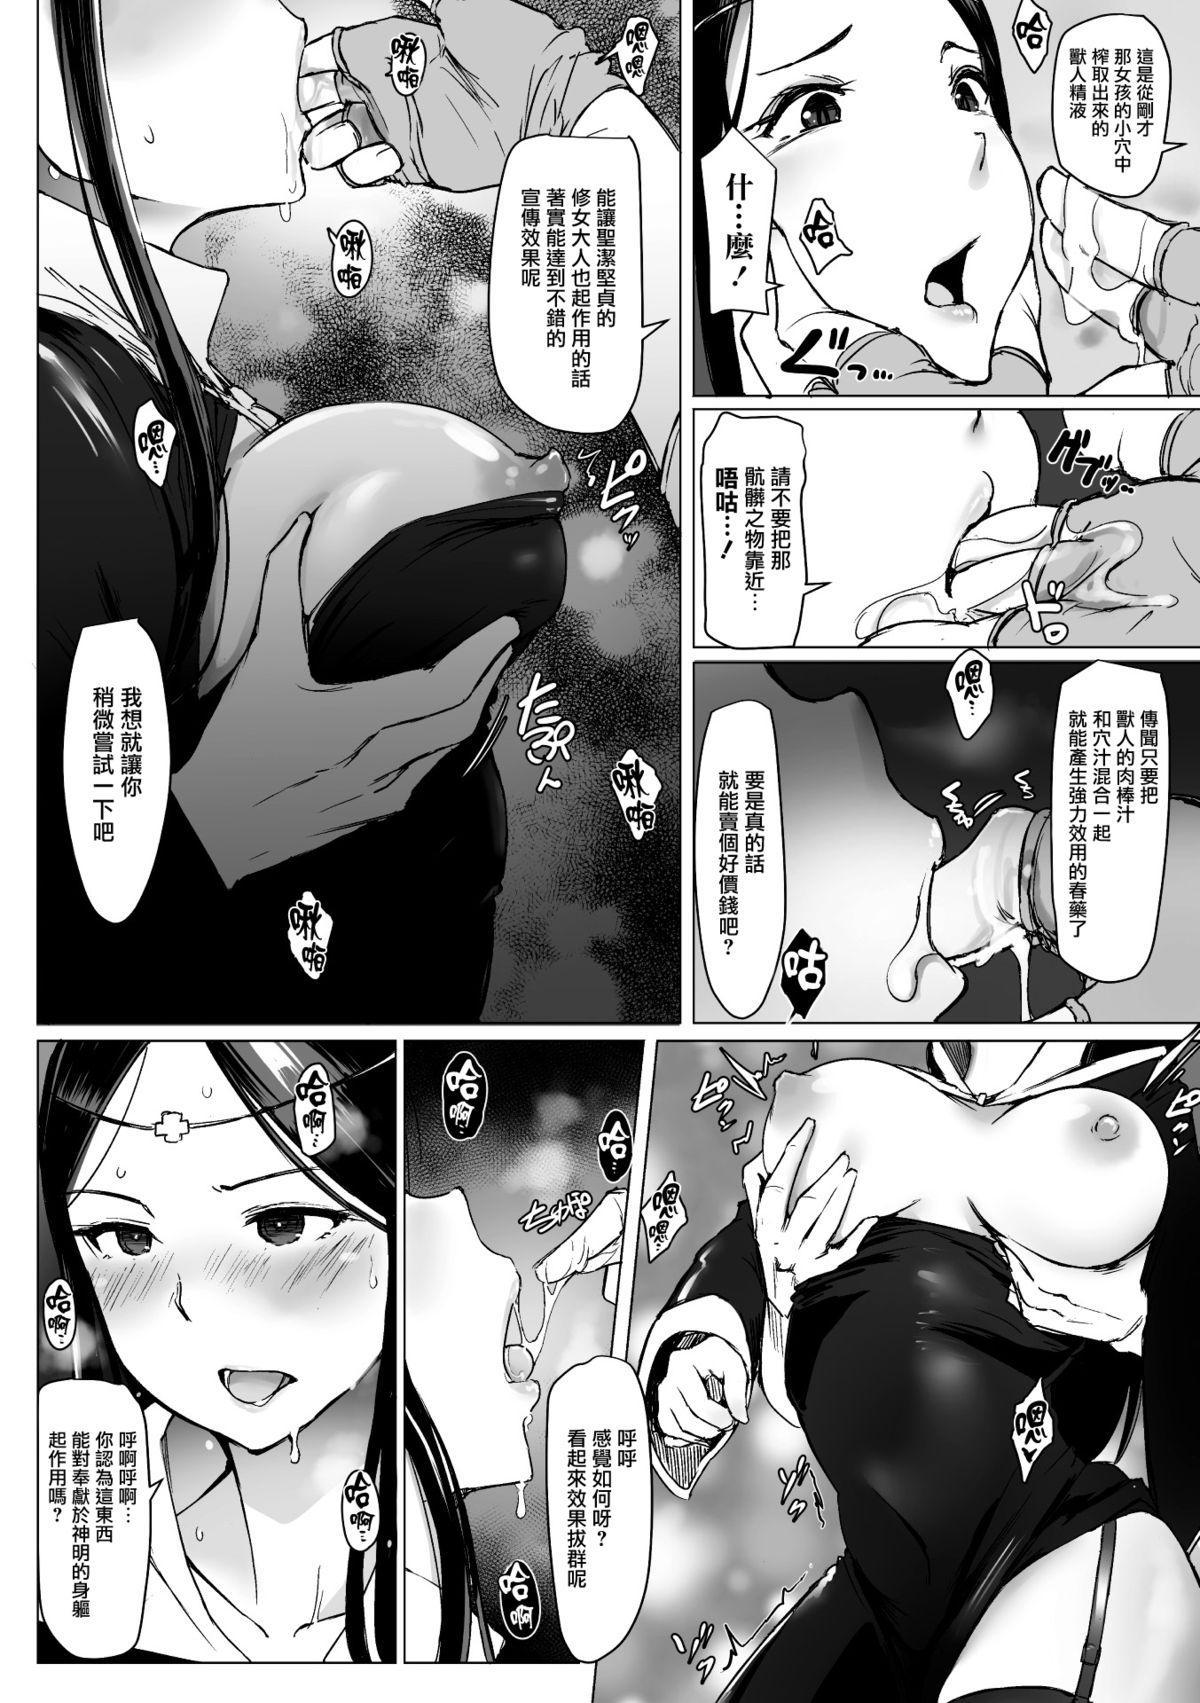 Yamaneko Kishidan Monogatari Onna Kishi Irina Dainiwa 12